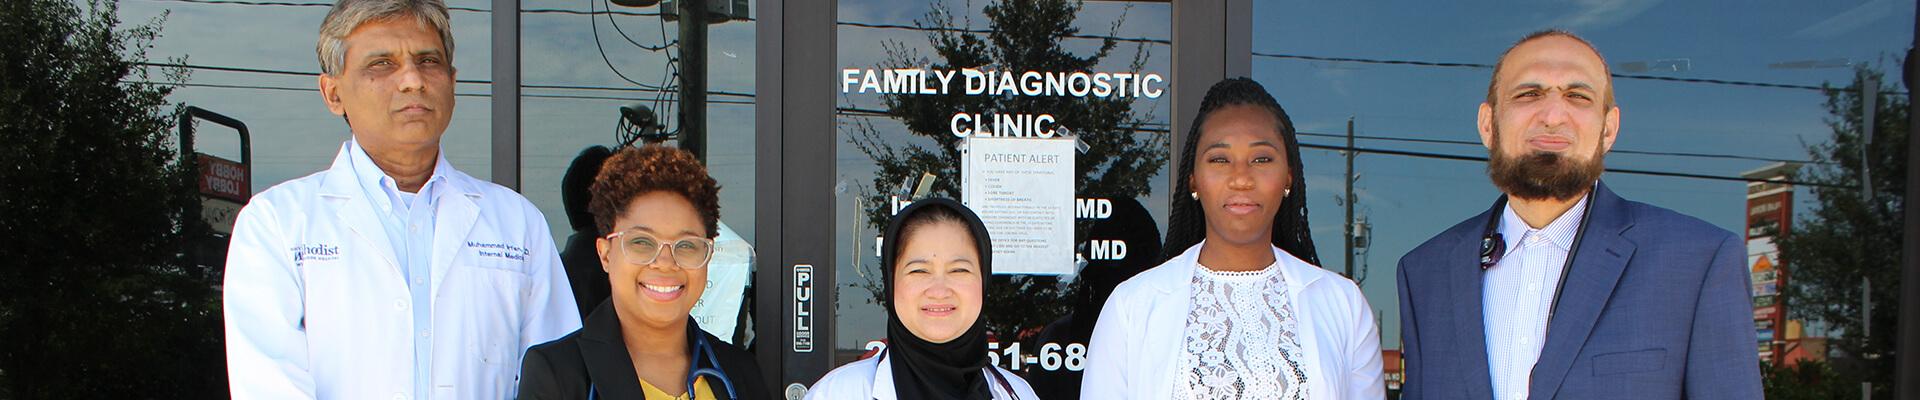 Family Diagnostic Clinic